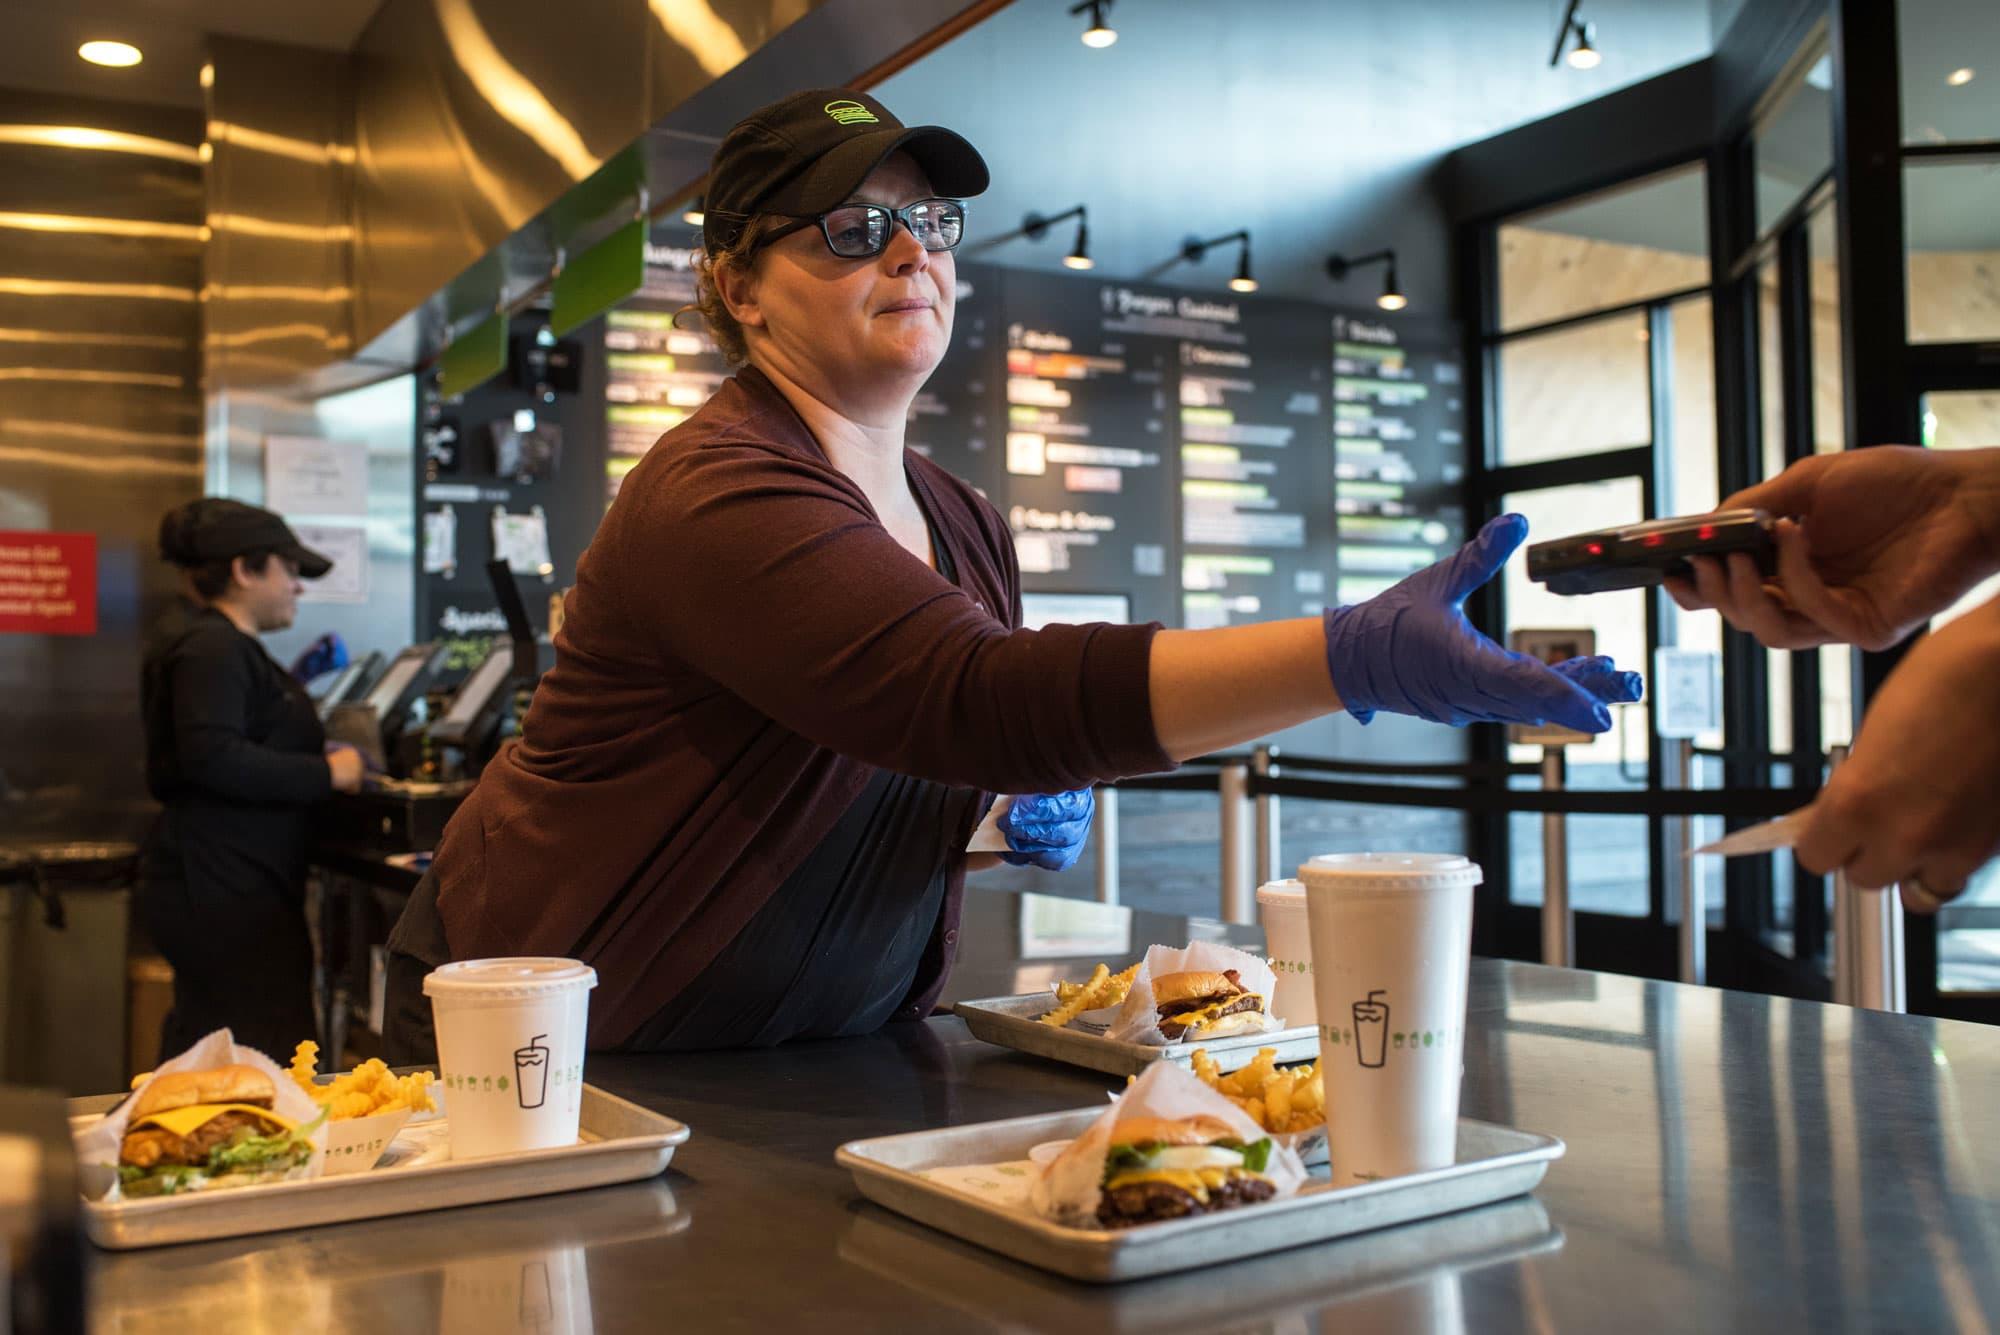 Restaurants take aim at improving manager turnover rates